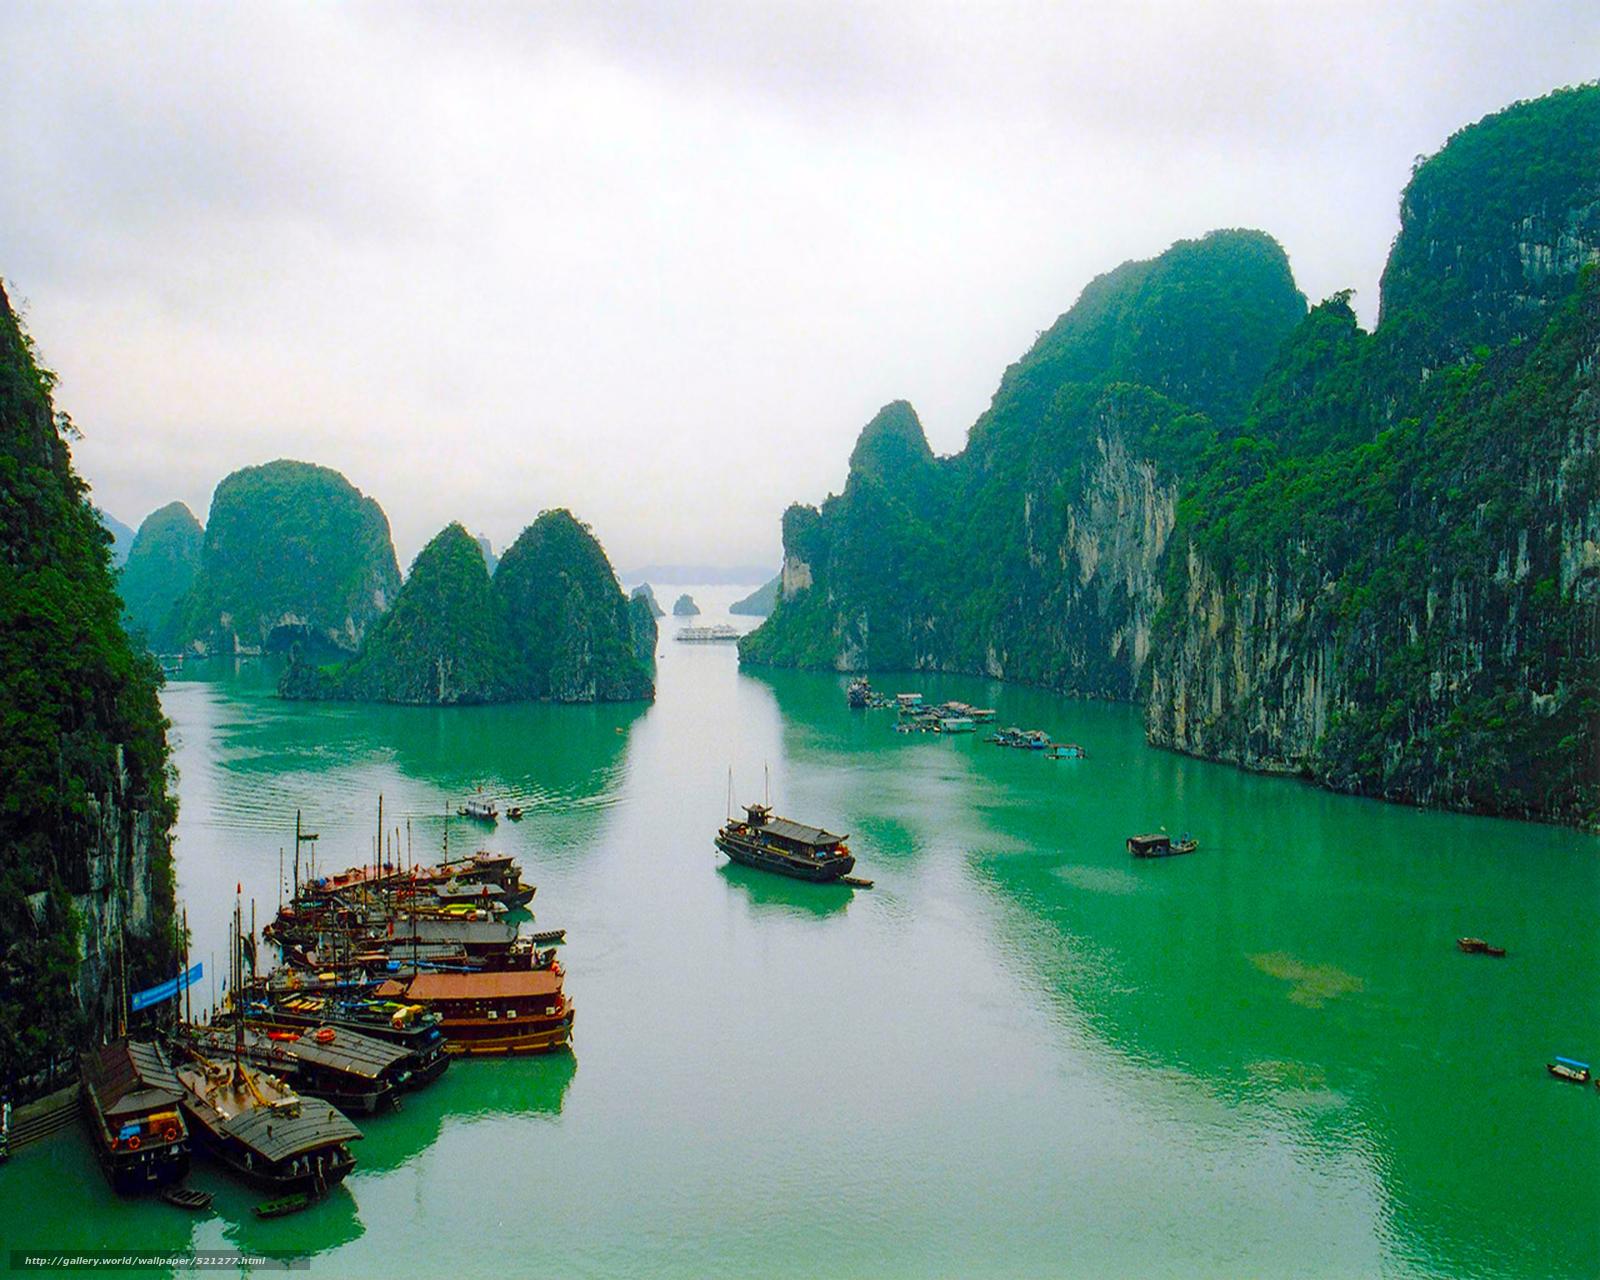 Download wallpaper Vietnam Mountains Ships desktop wallpaper in 1600x1280